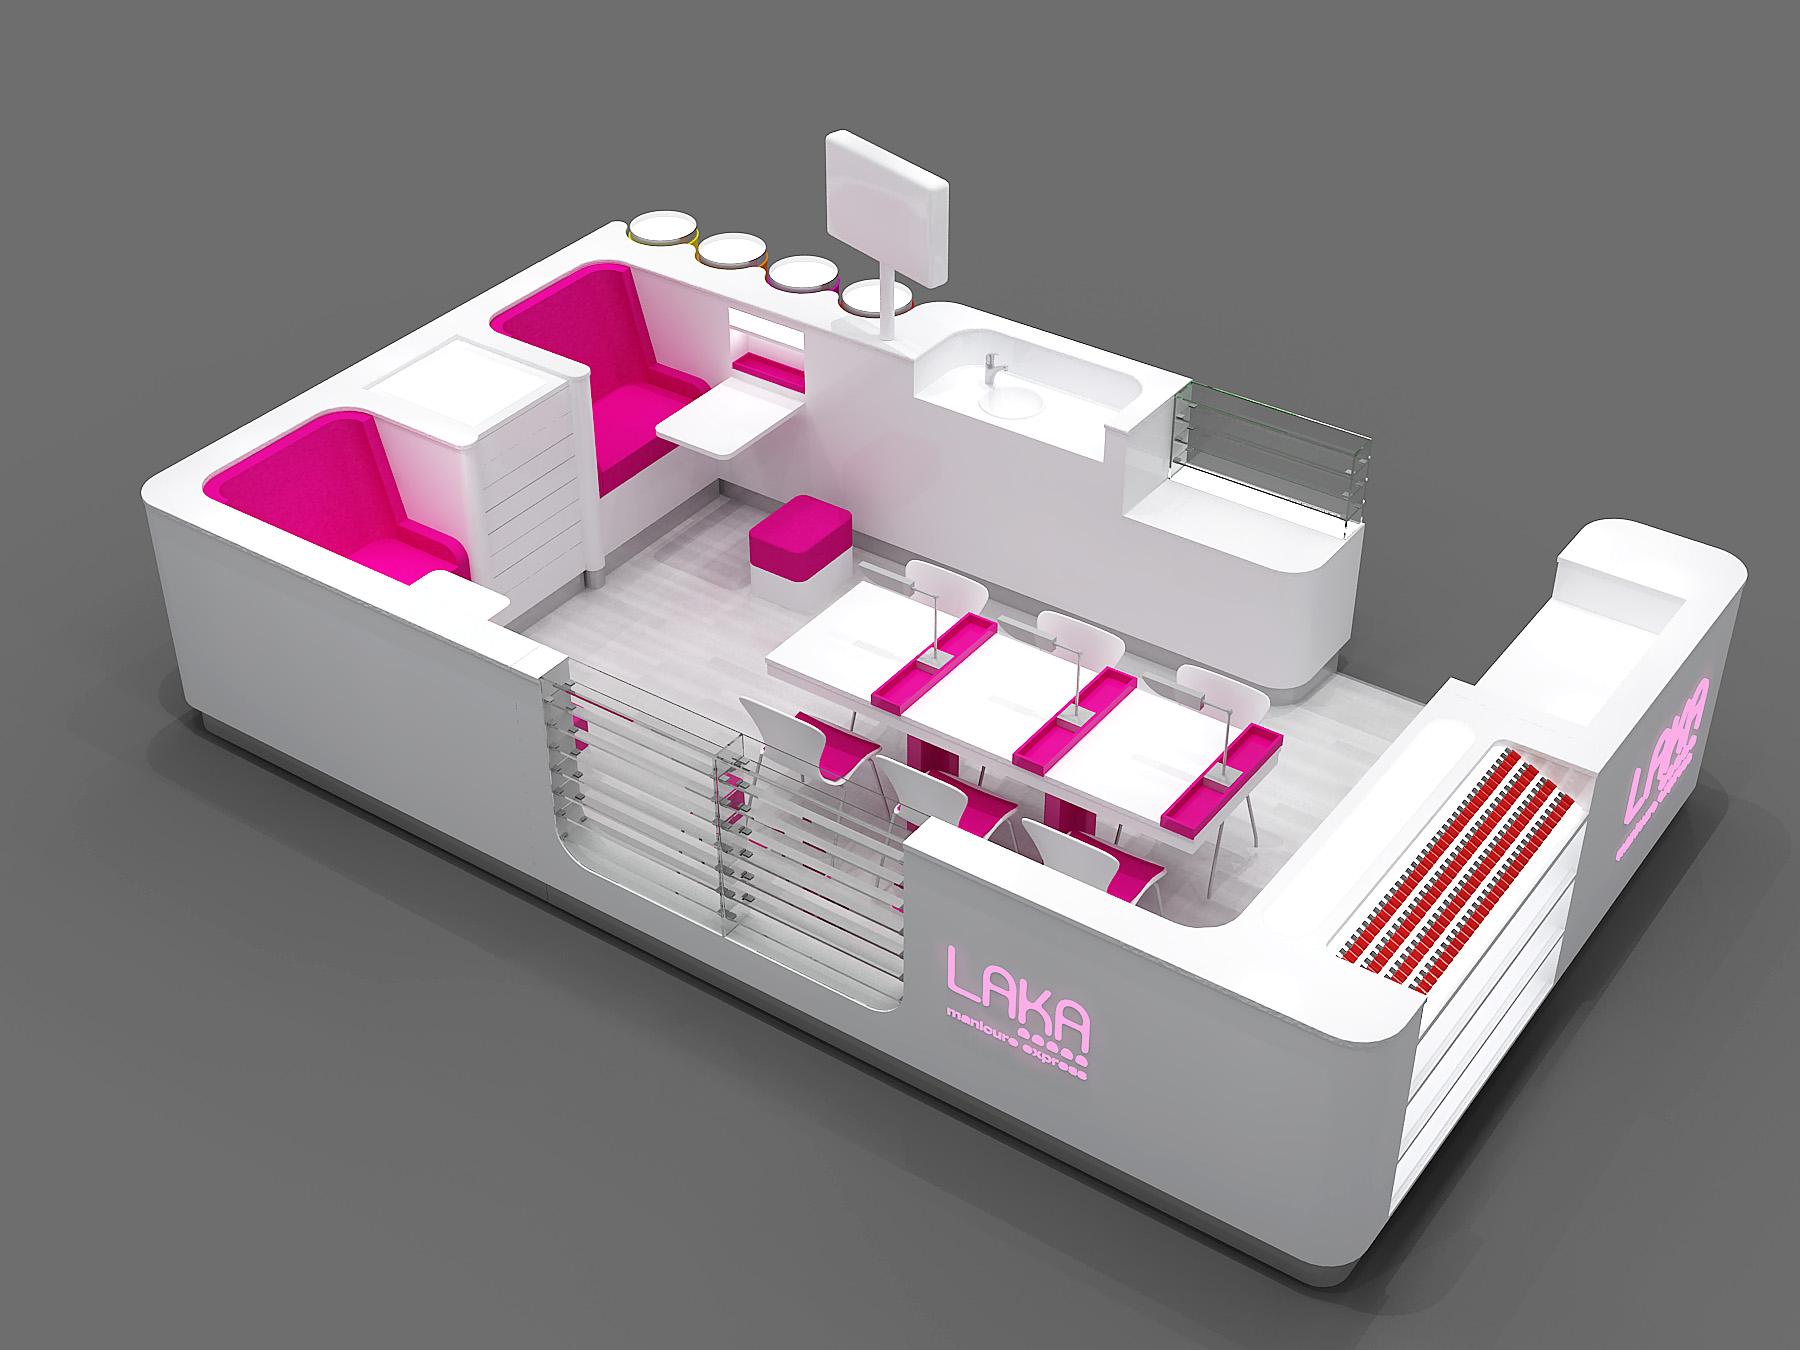 classical pink white laka nail express kiosk